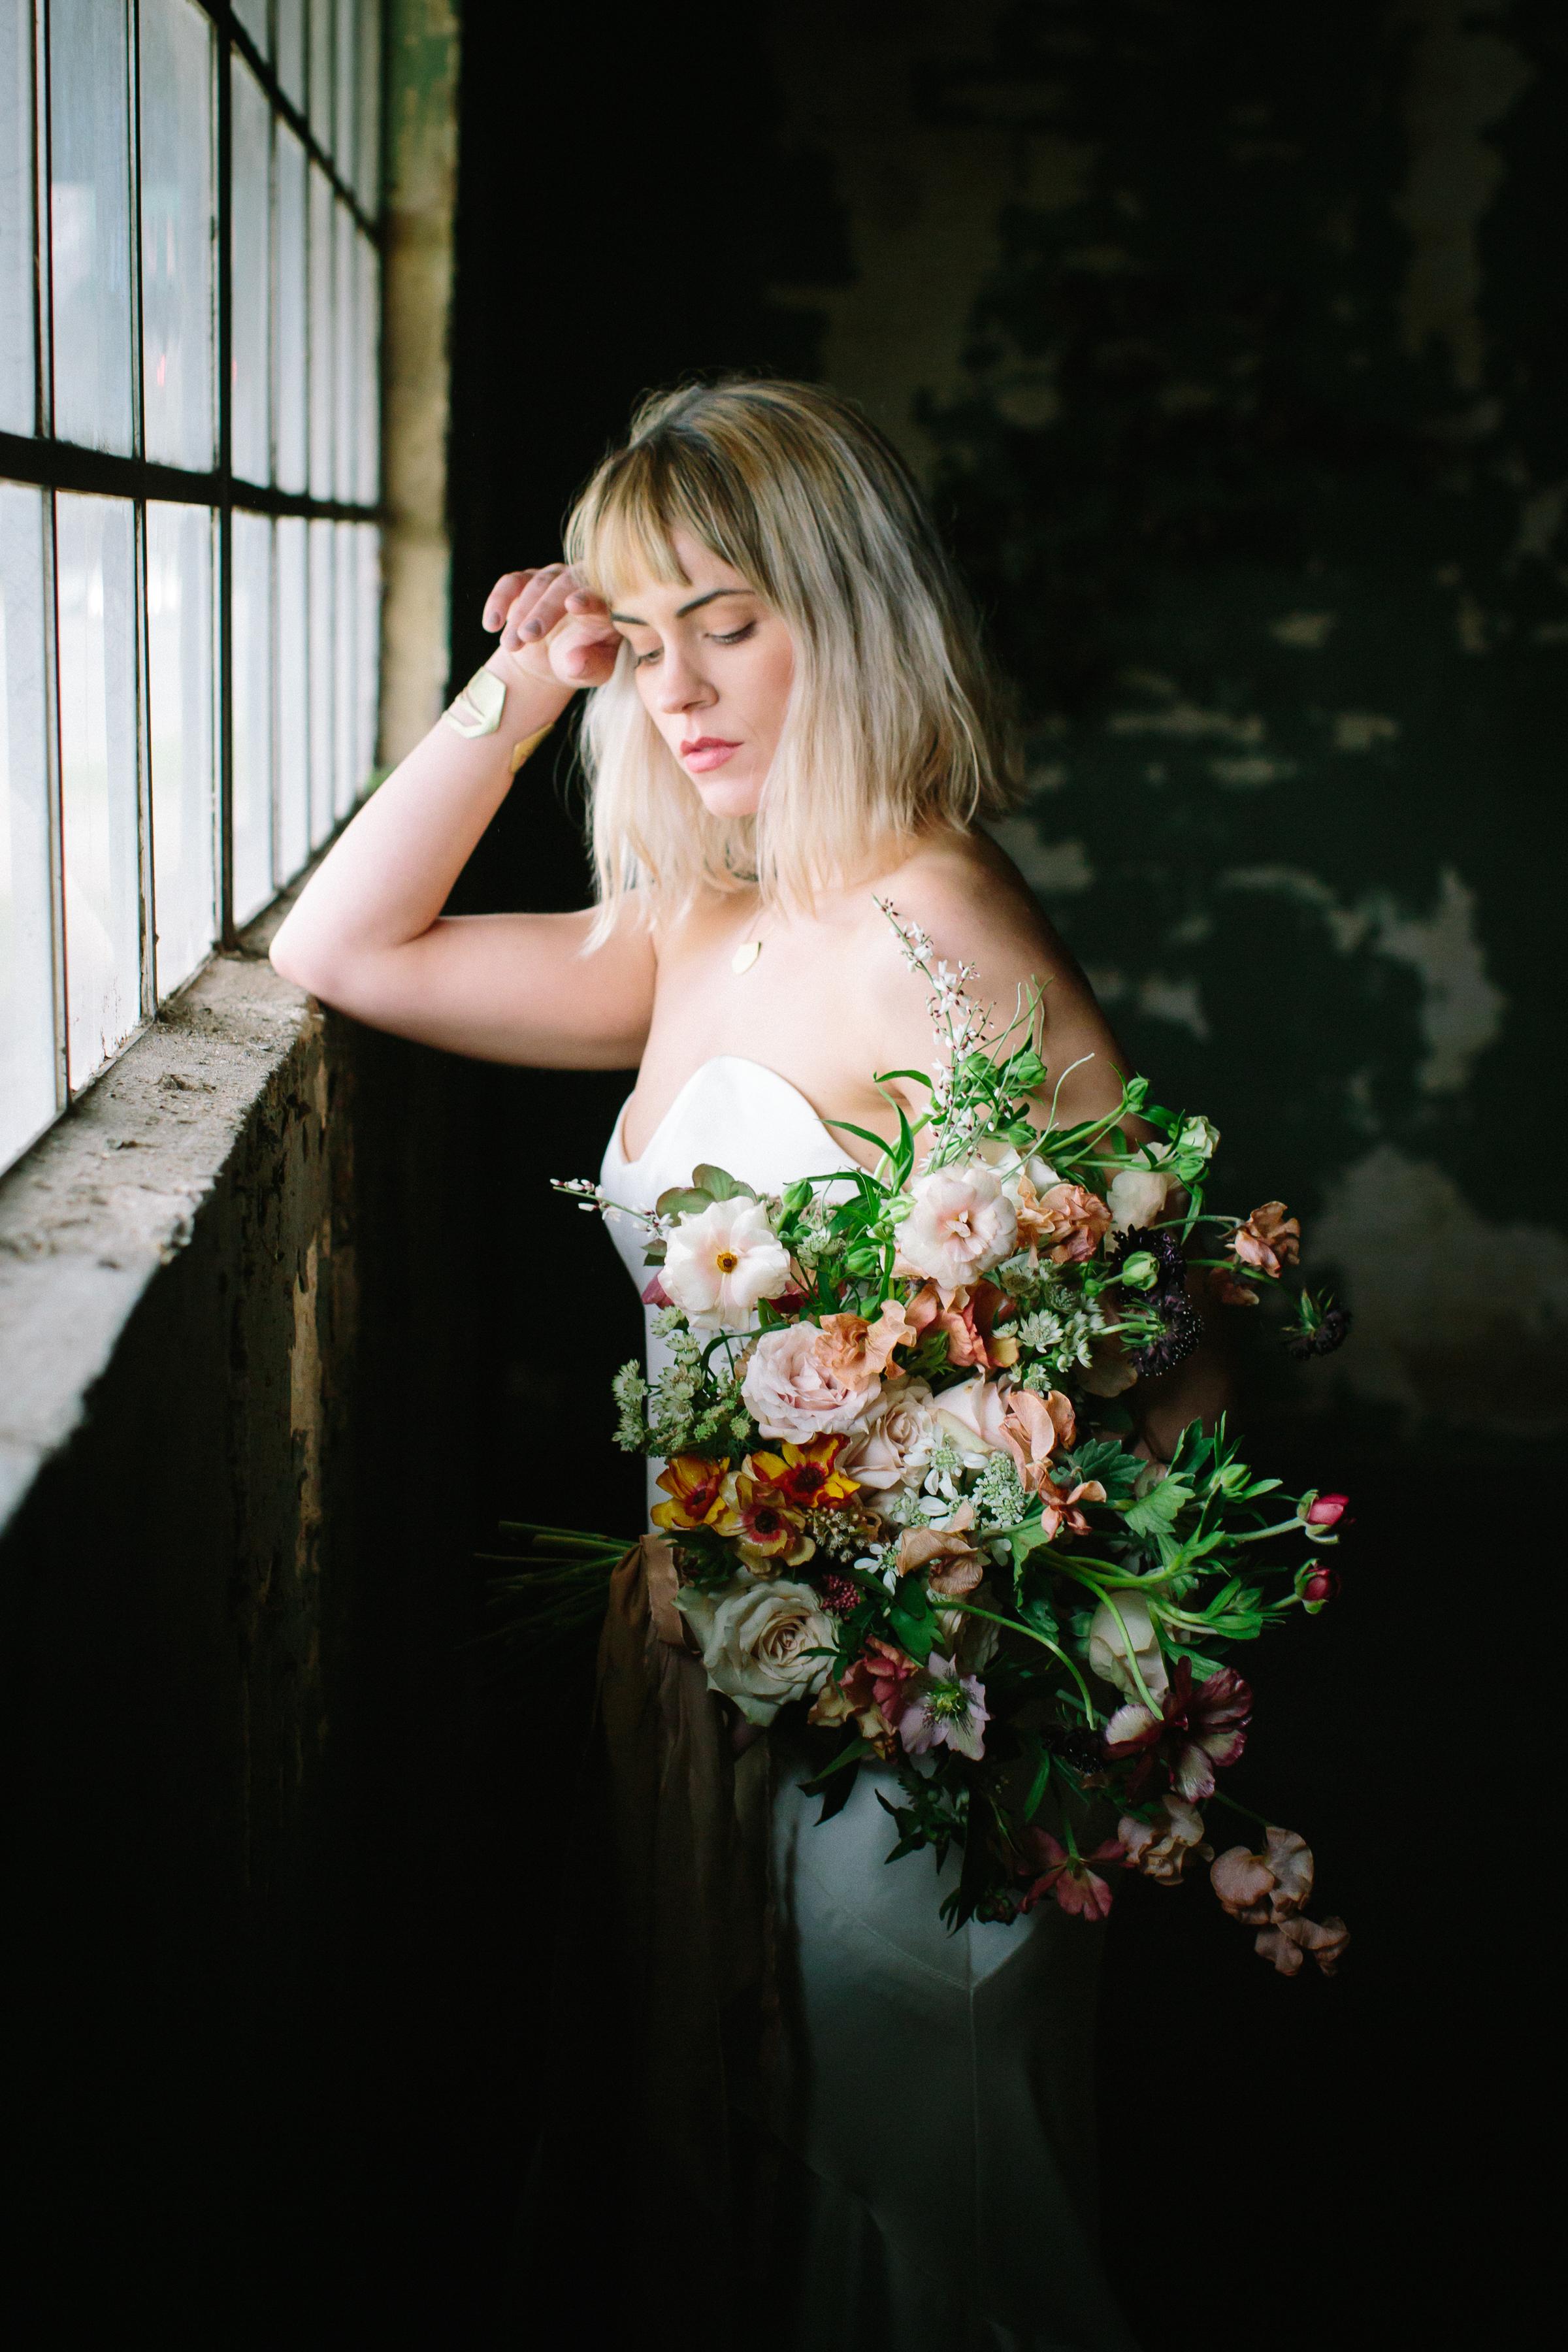 spring_flowers_bouquet_bridal_floridesigns (6 of 25).jpg